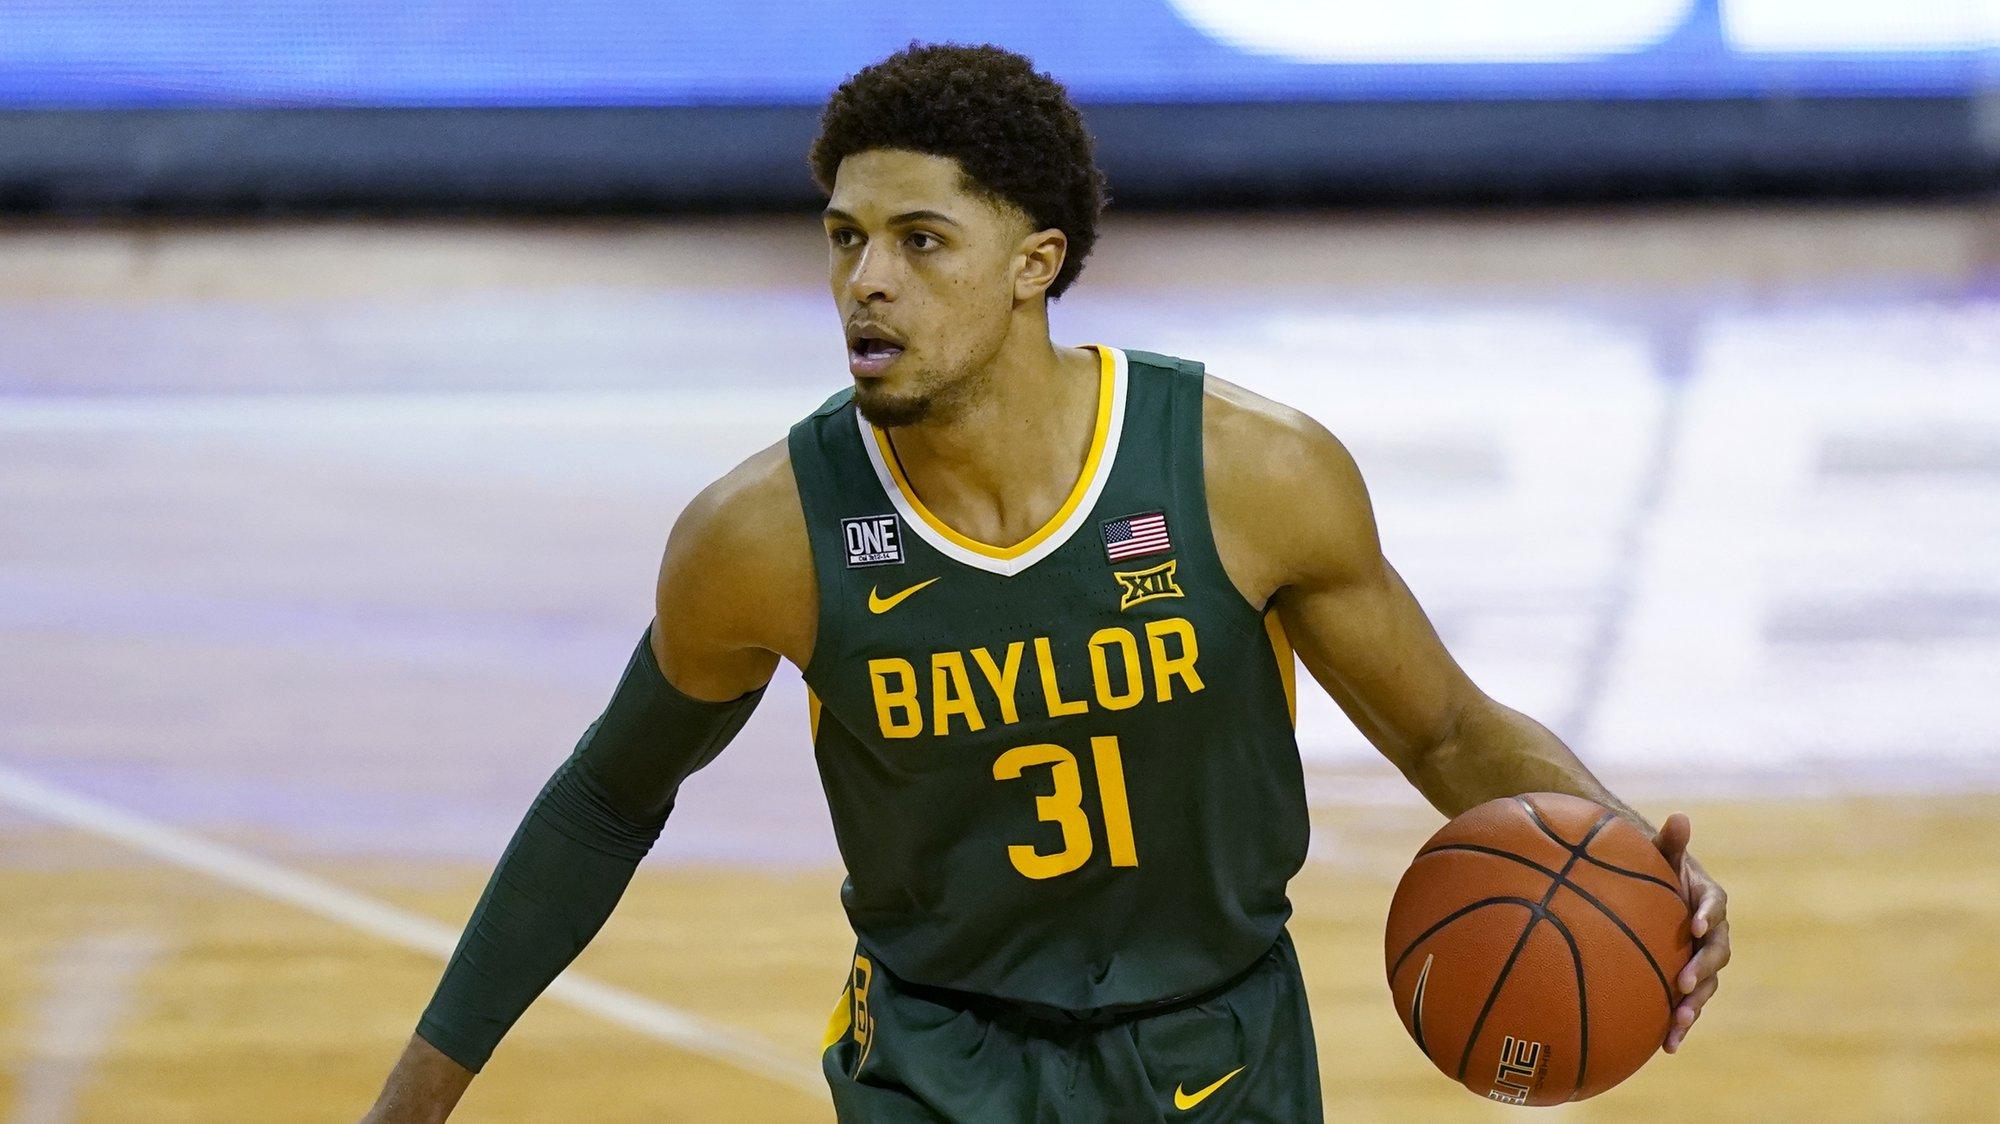 Baylor guard MaCio Teague (31) during an NCAA college basketball game against Texas, Tuesday, Feb. 2, 2021, in Austin, Texas. (AP Photo/Eric Gay)